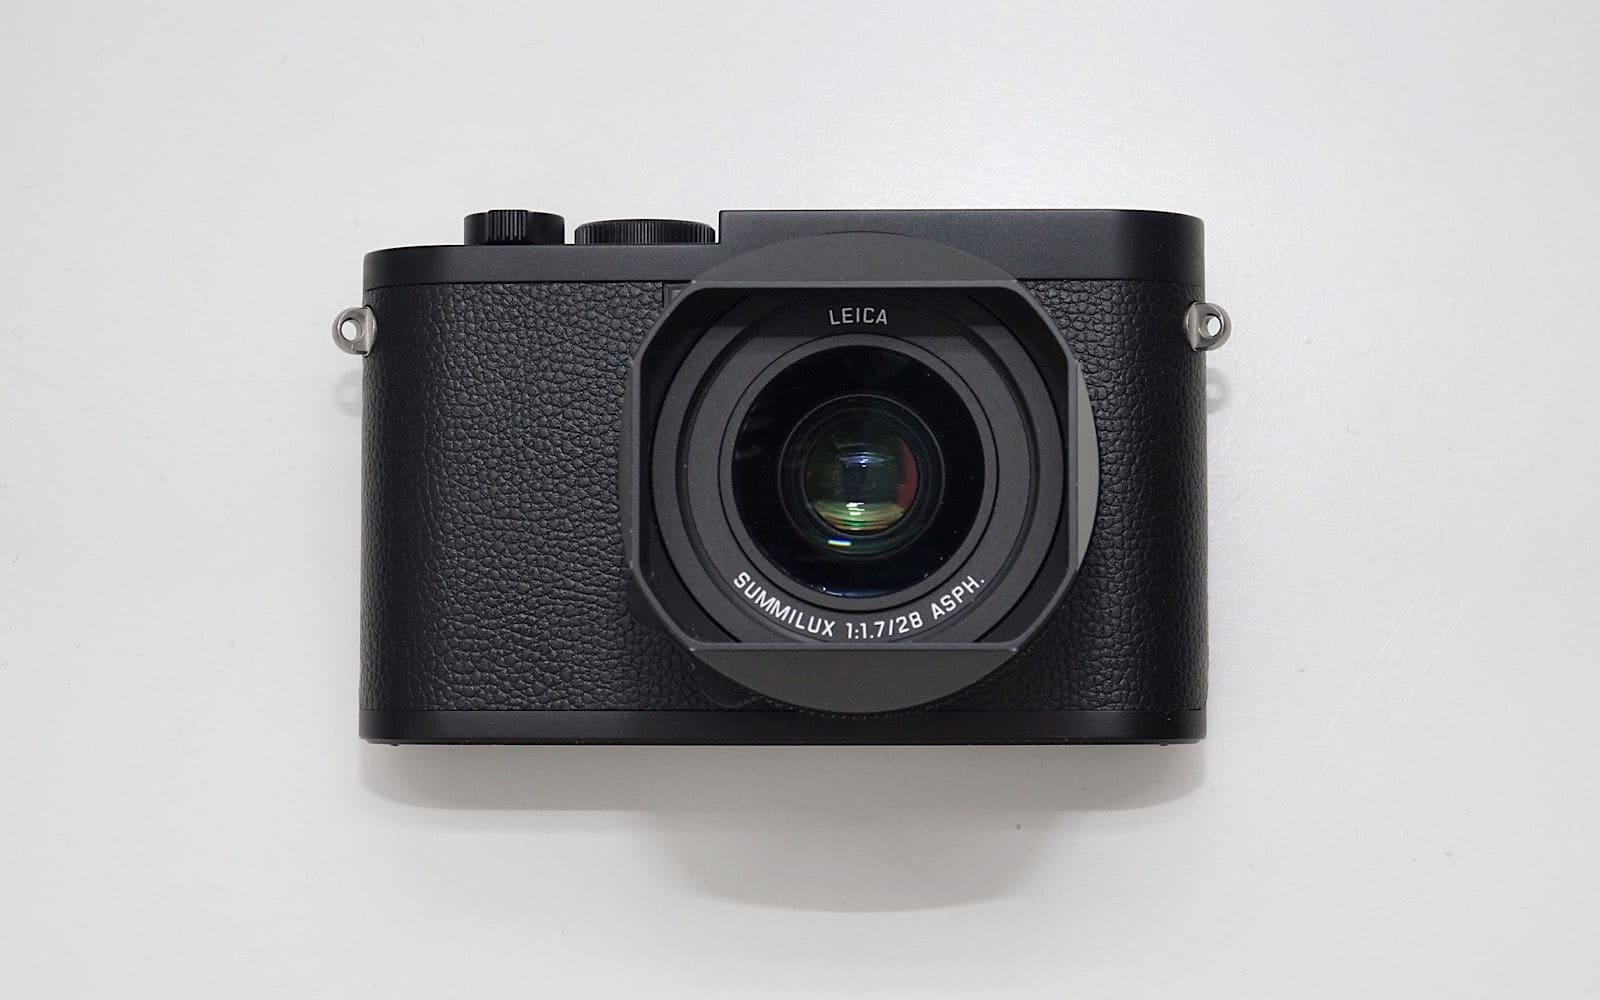 Leica's Q2 Monochrome reviewed